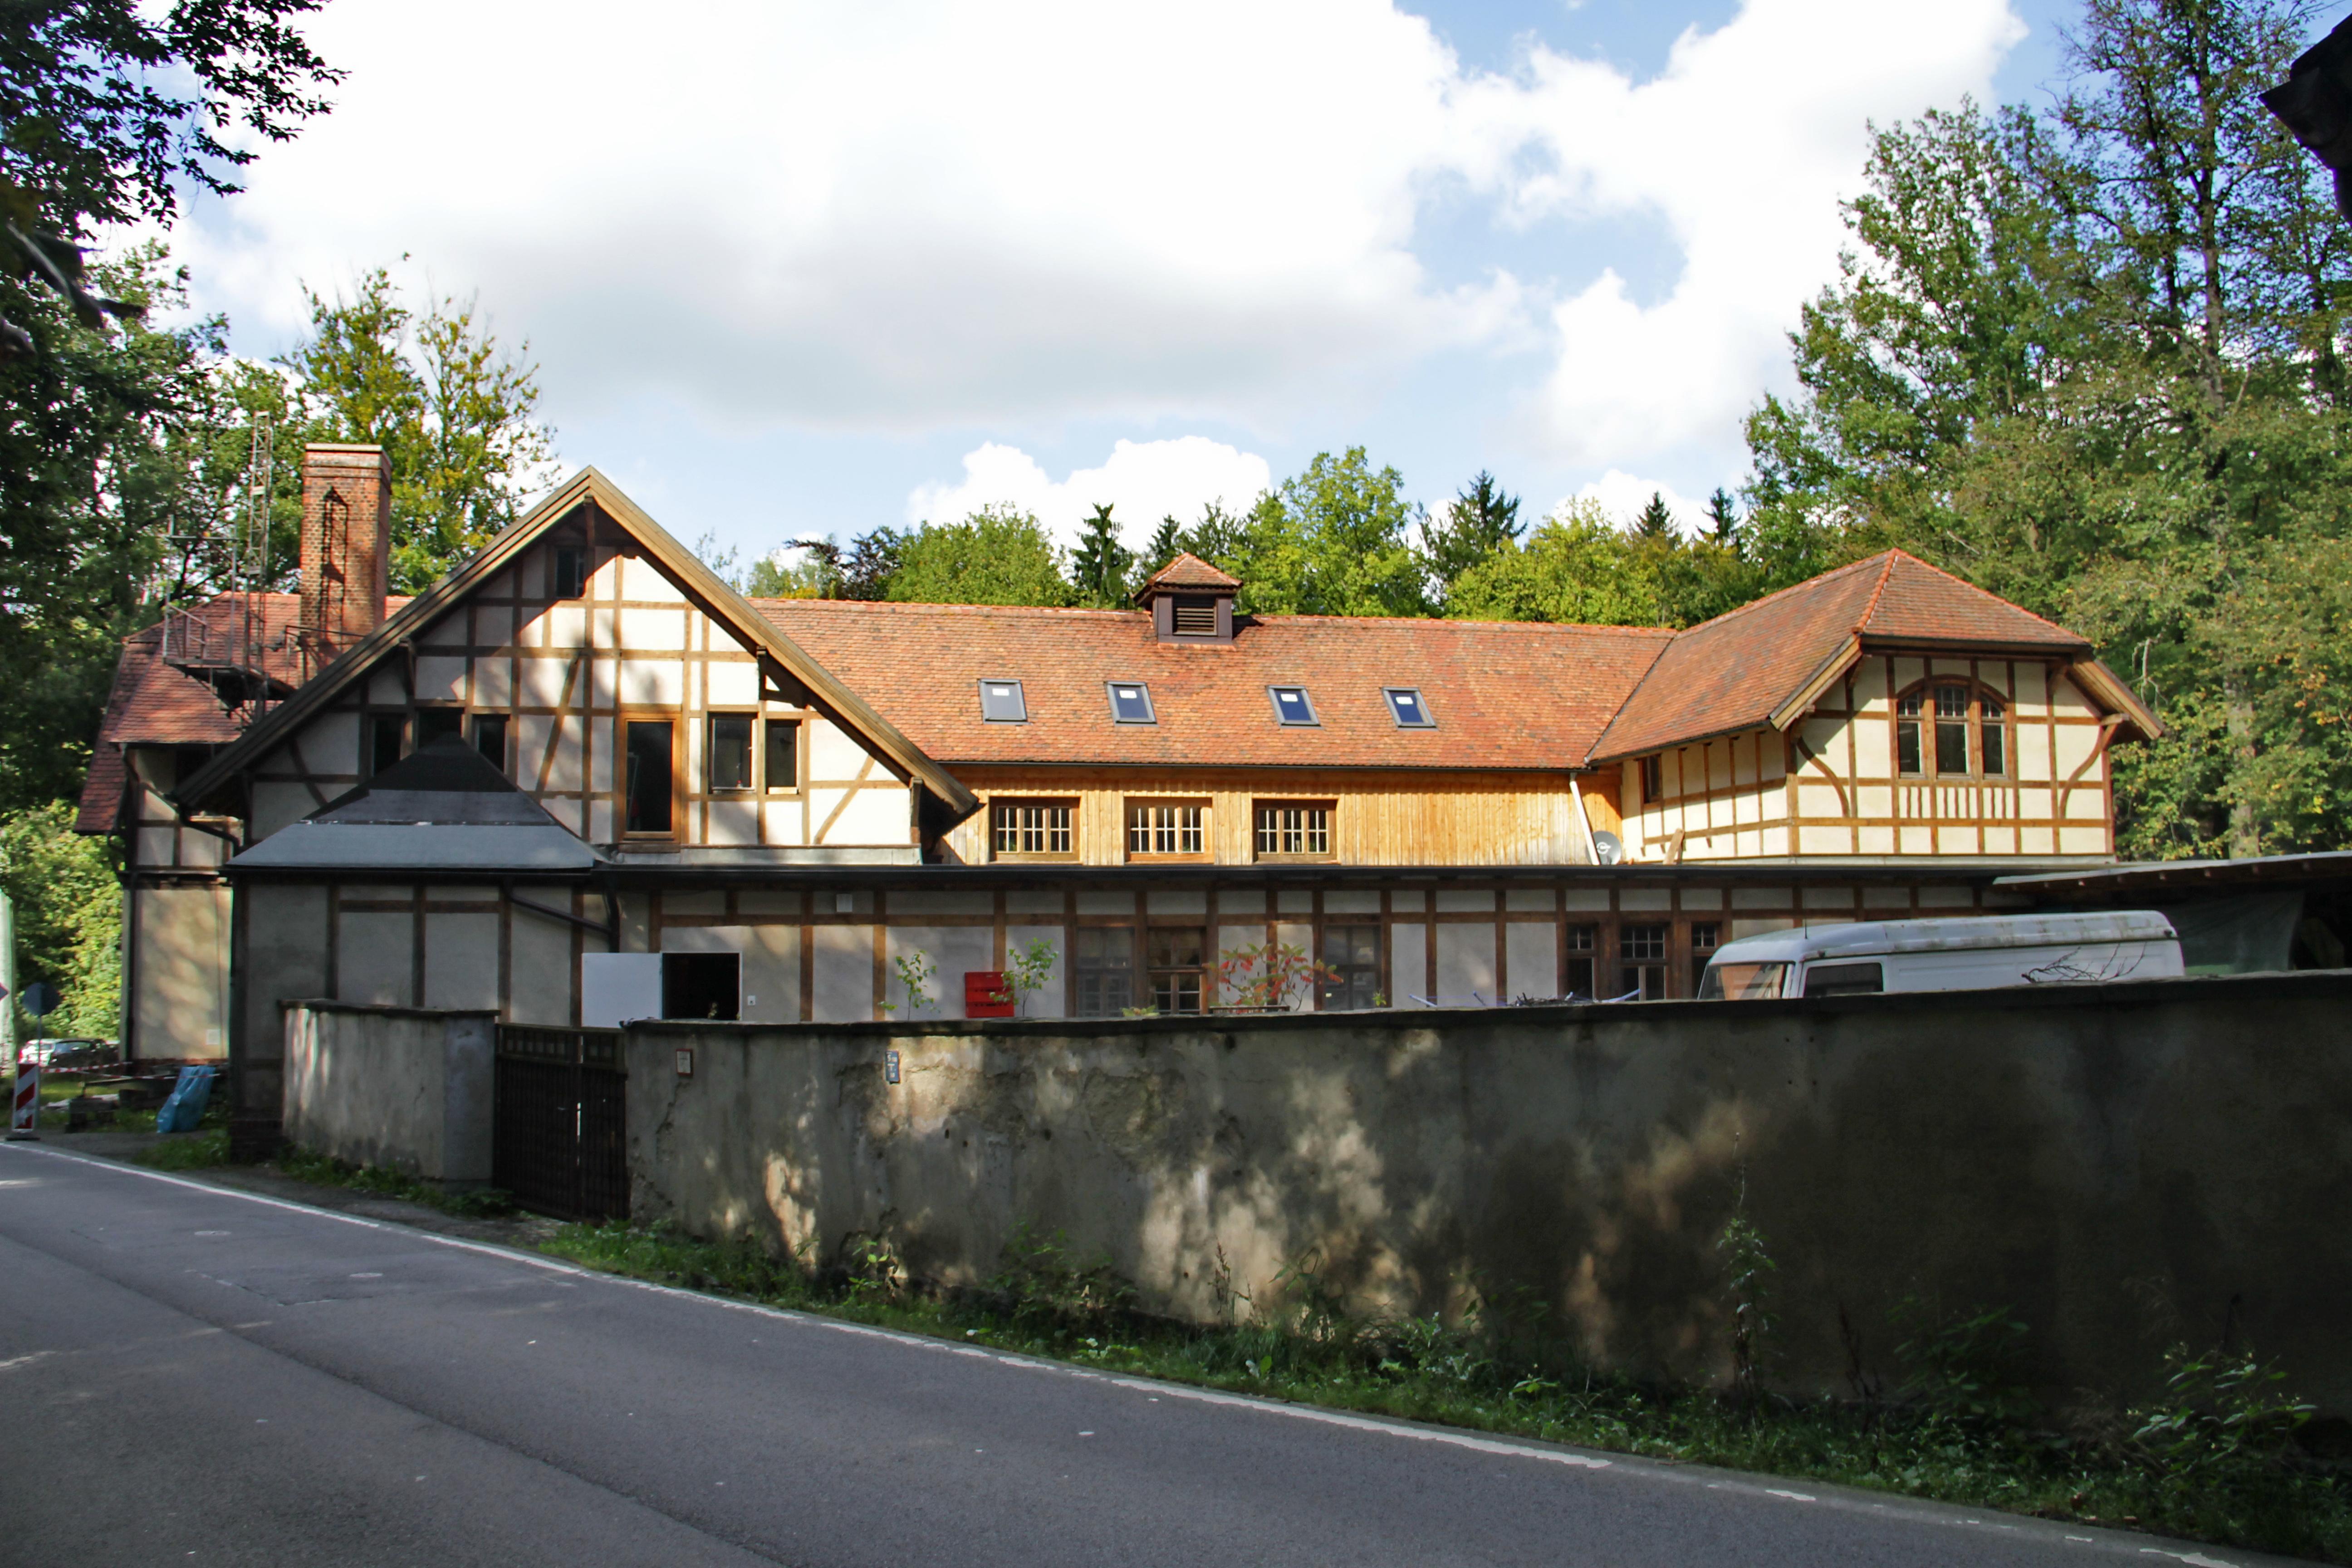 File:Zeisigwald Zeisigwaldschänke 2 LvT.JPG - Wikimedia Commons